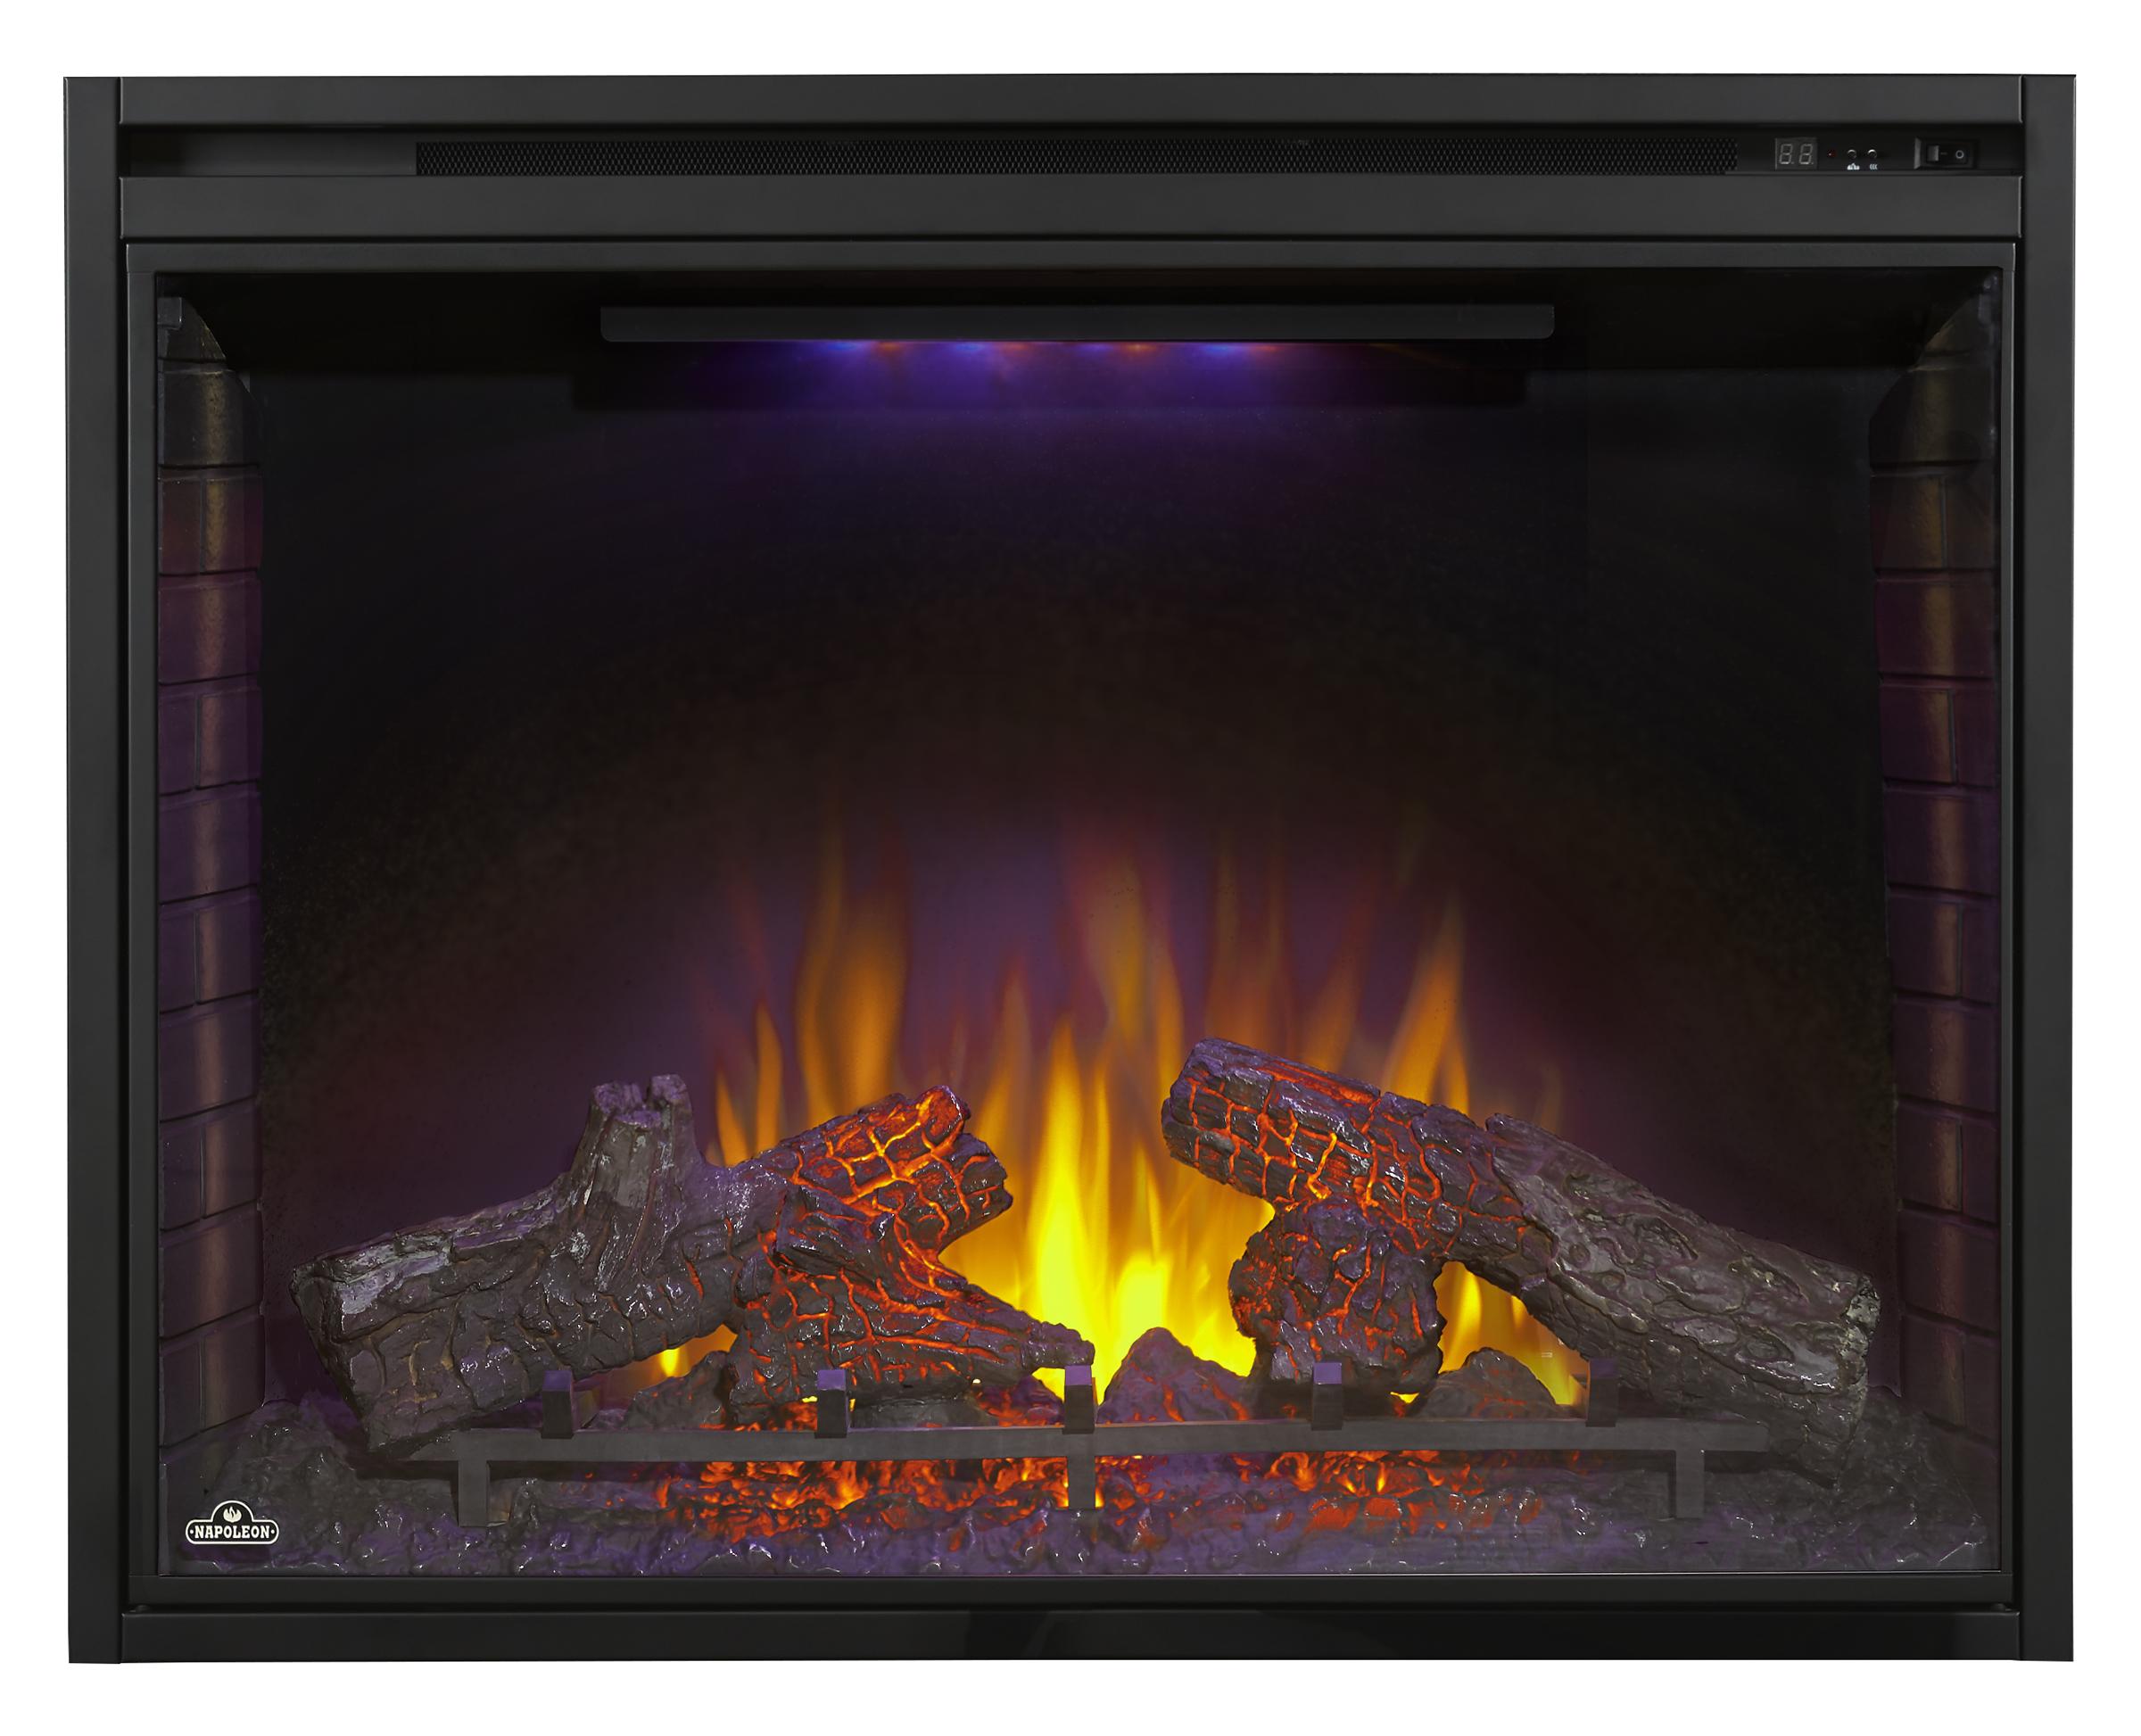 bef40h-purple-napoleon-fireplaces.jpg